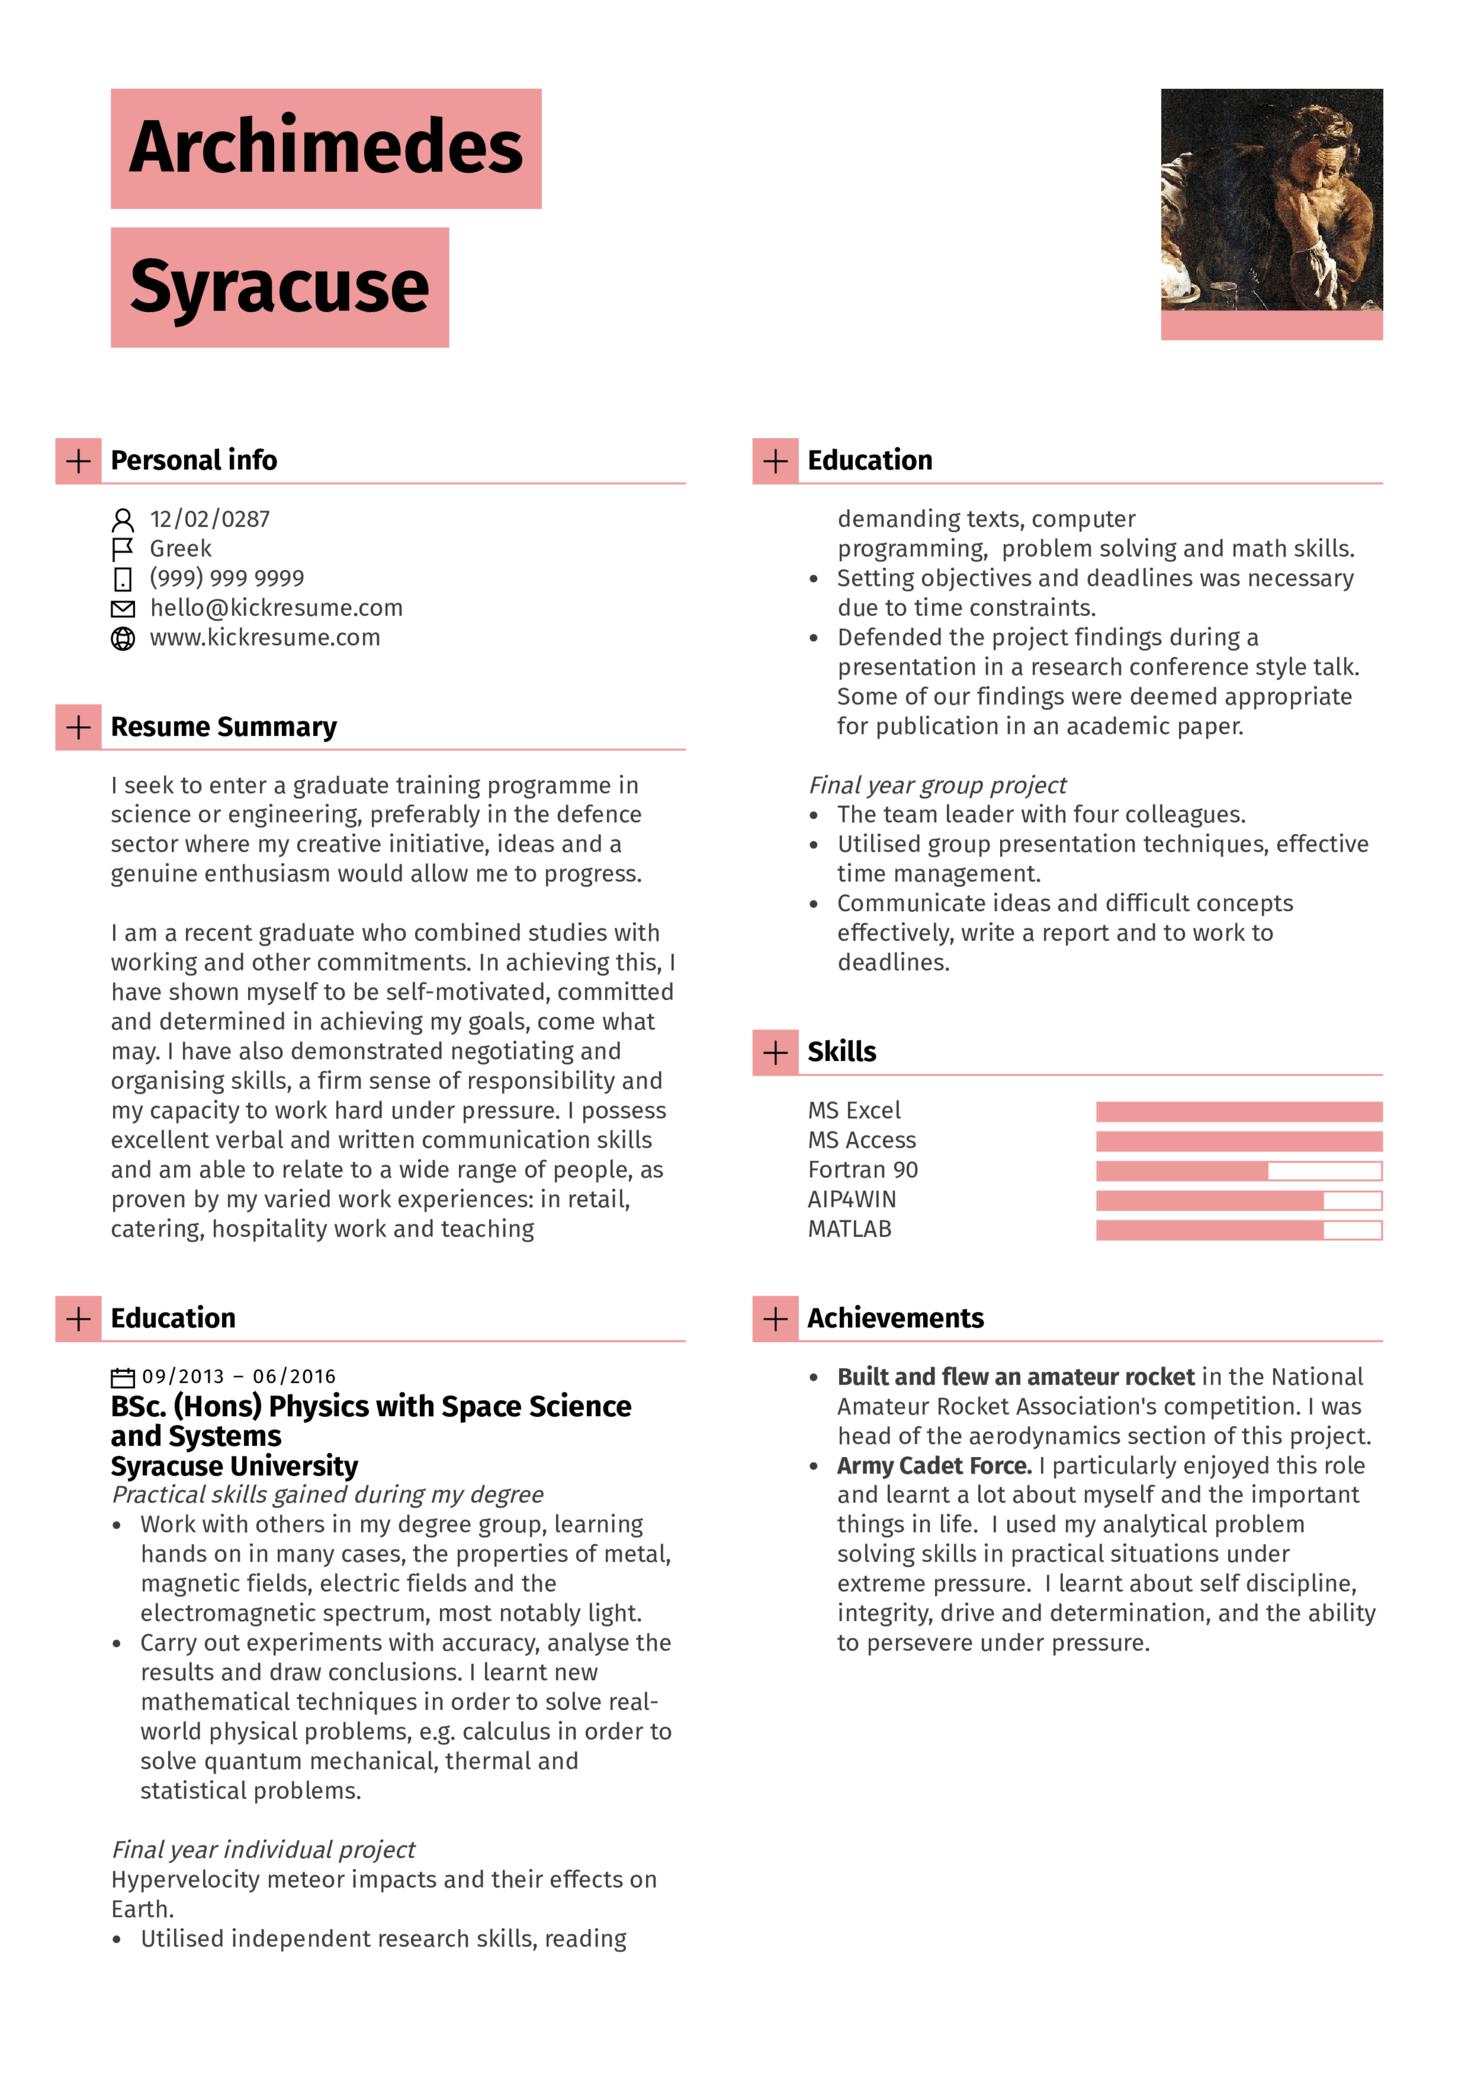 Student Resume Physics (Parte 1)